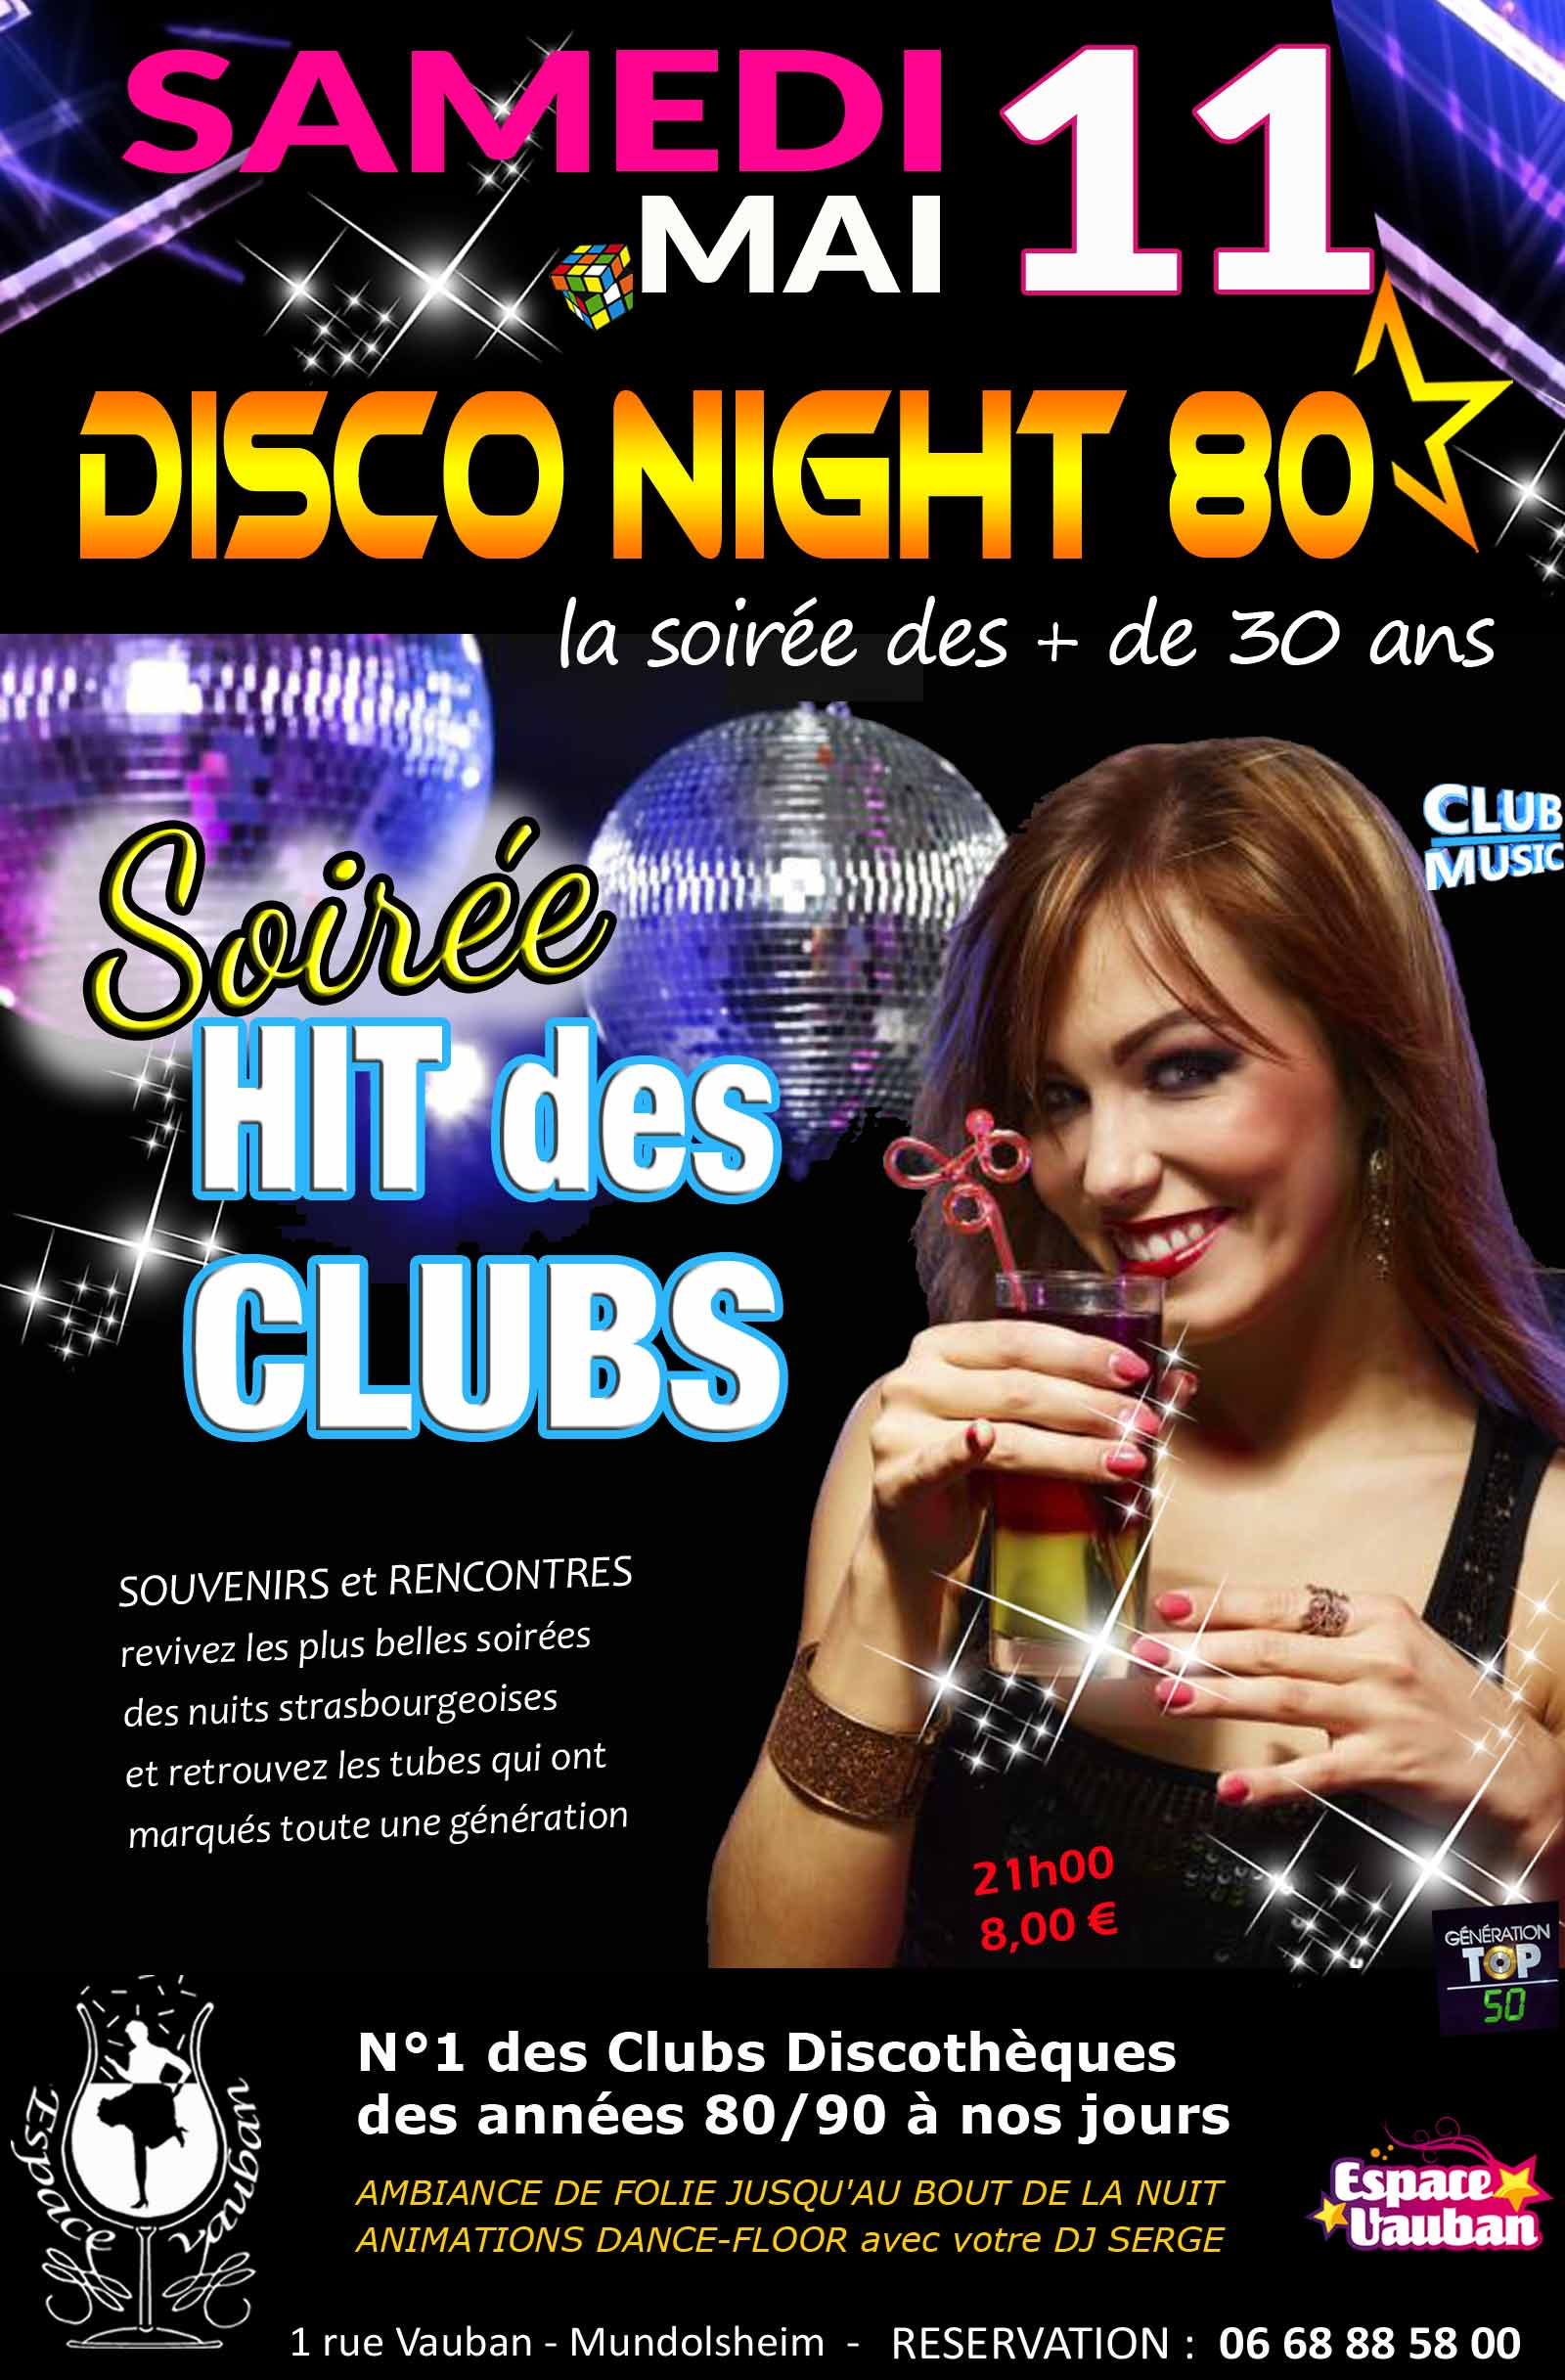 Disco Night 80 - Hit des Clubs - ESPACE VAUBAN